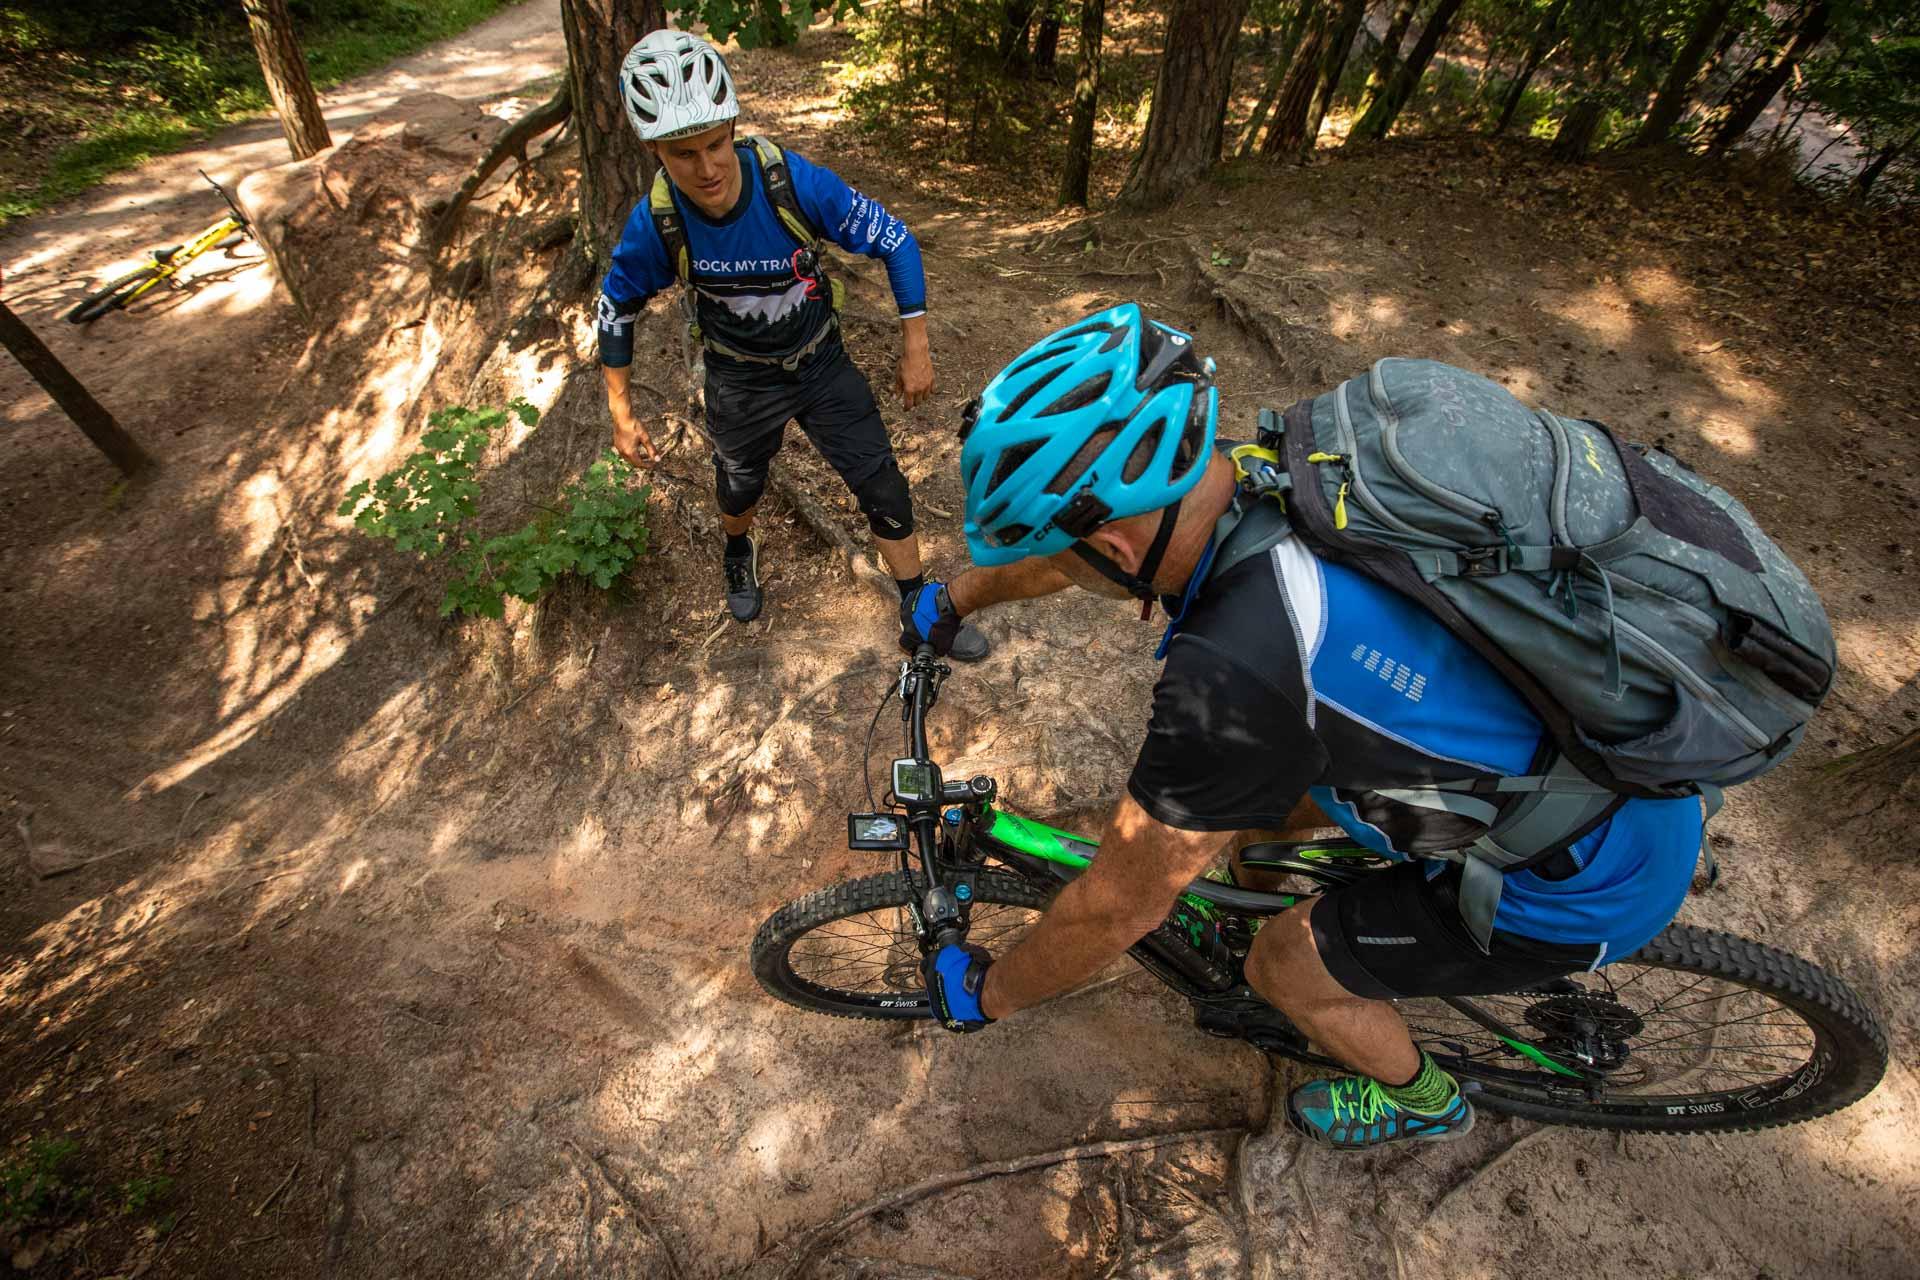 eMTB eBike Fortgeschritten Fahrtechnik Kurs in Siegen - Rock my Trail Bikeschule35